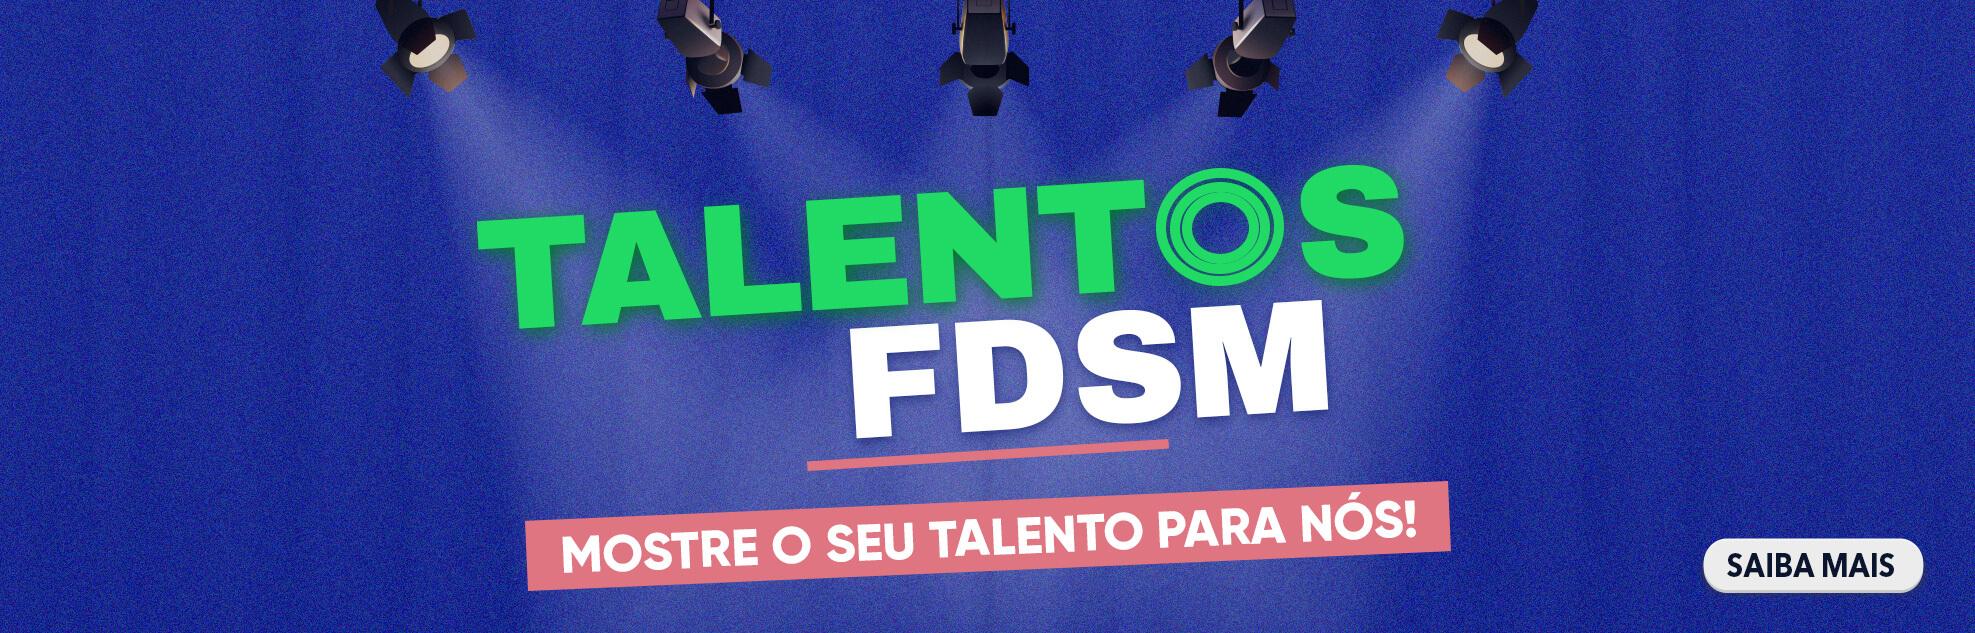 PROJETO TALENTOS FDSM